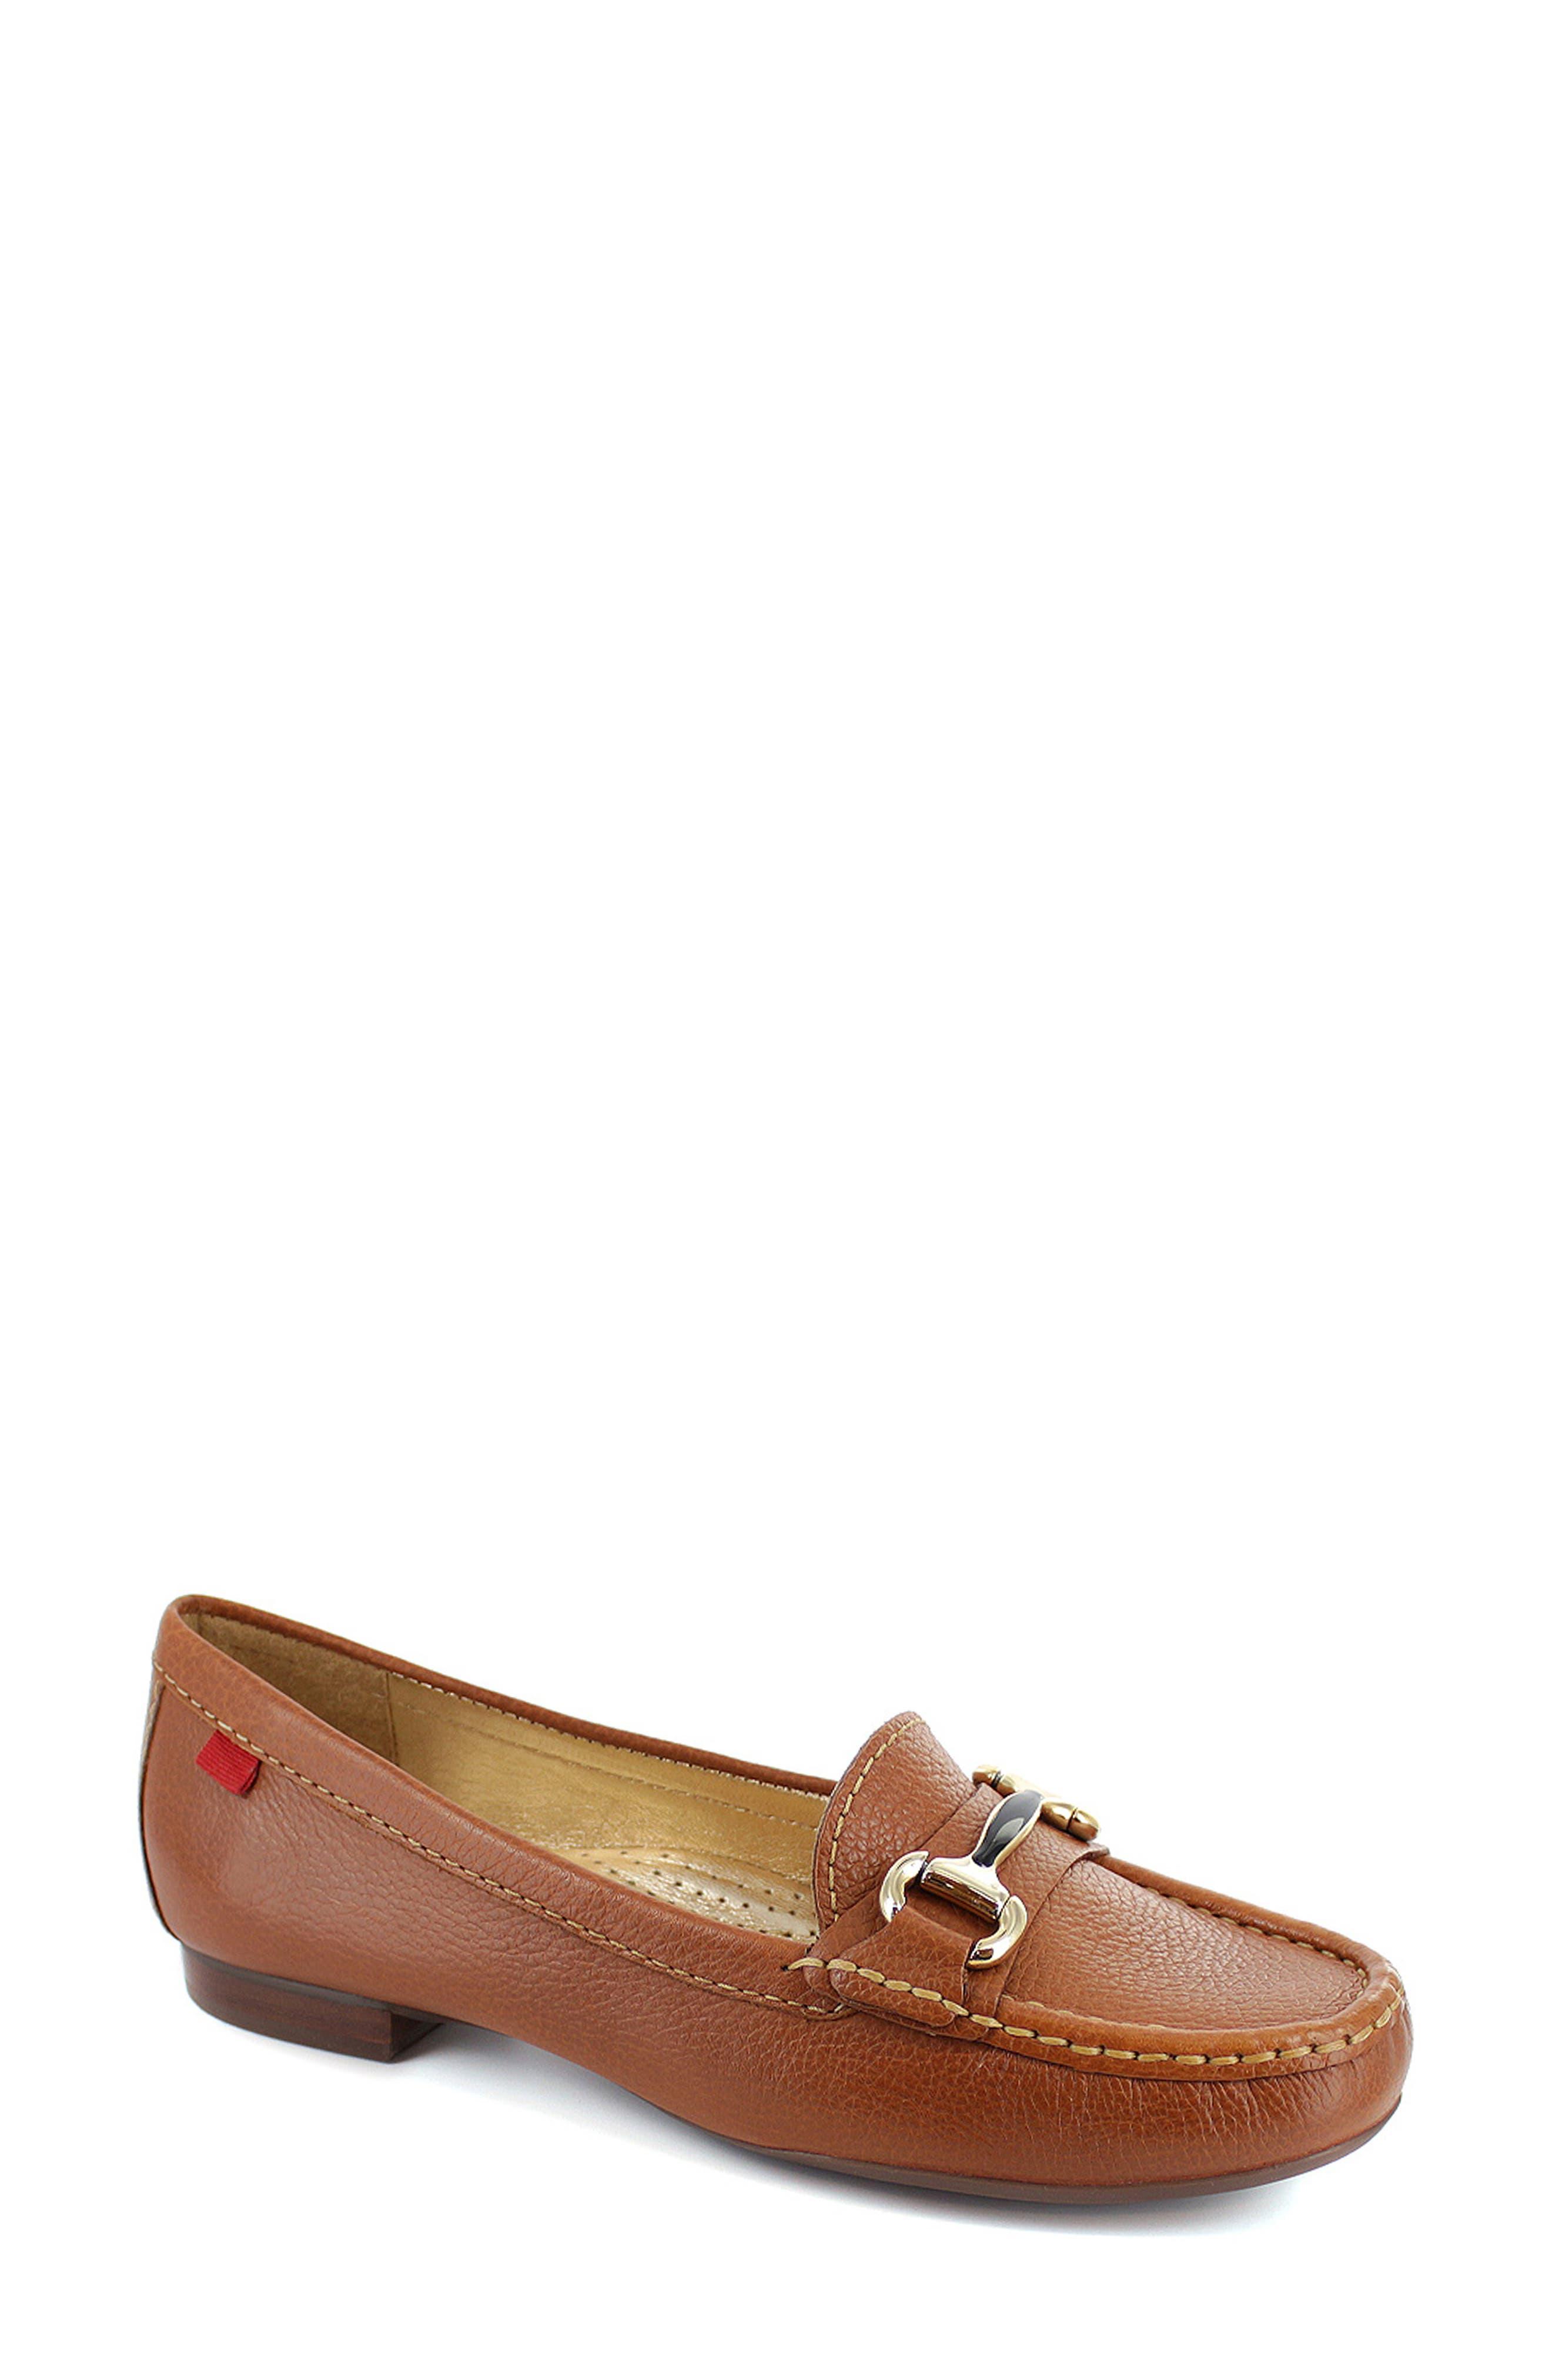 Marc Joseph New York Grand Street Loafer, Brown